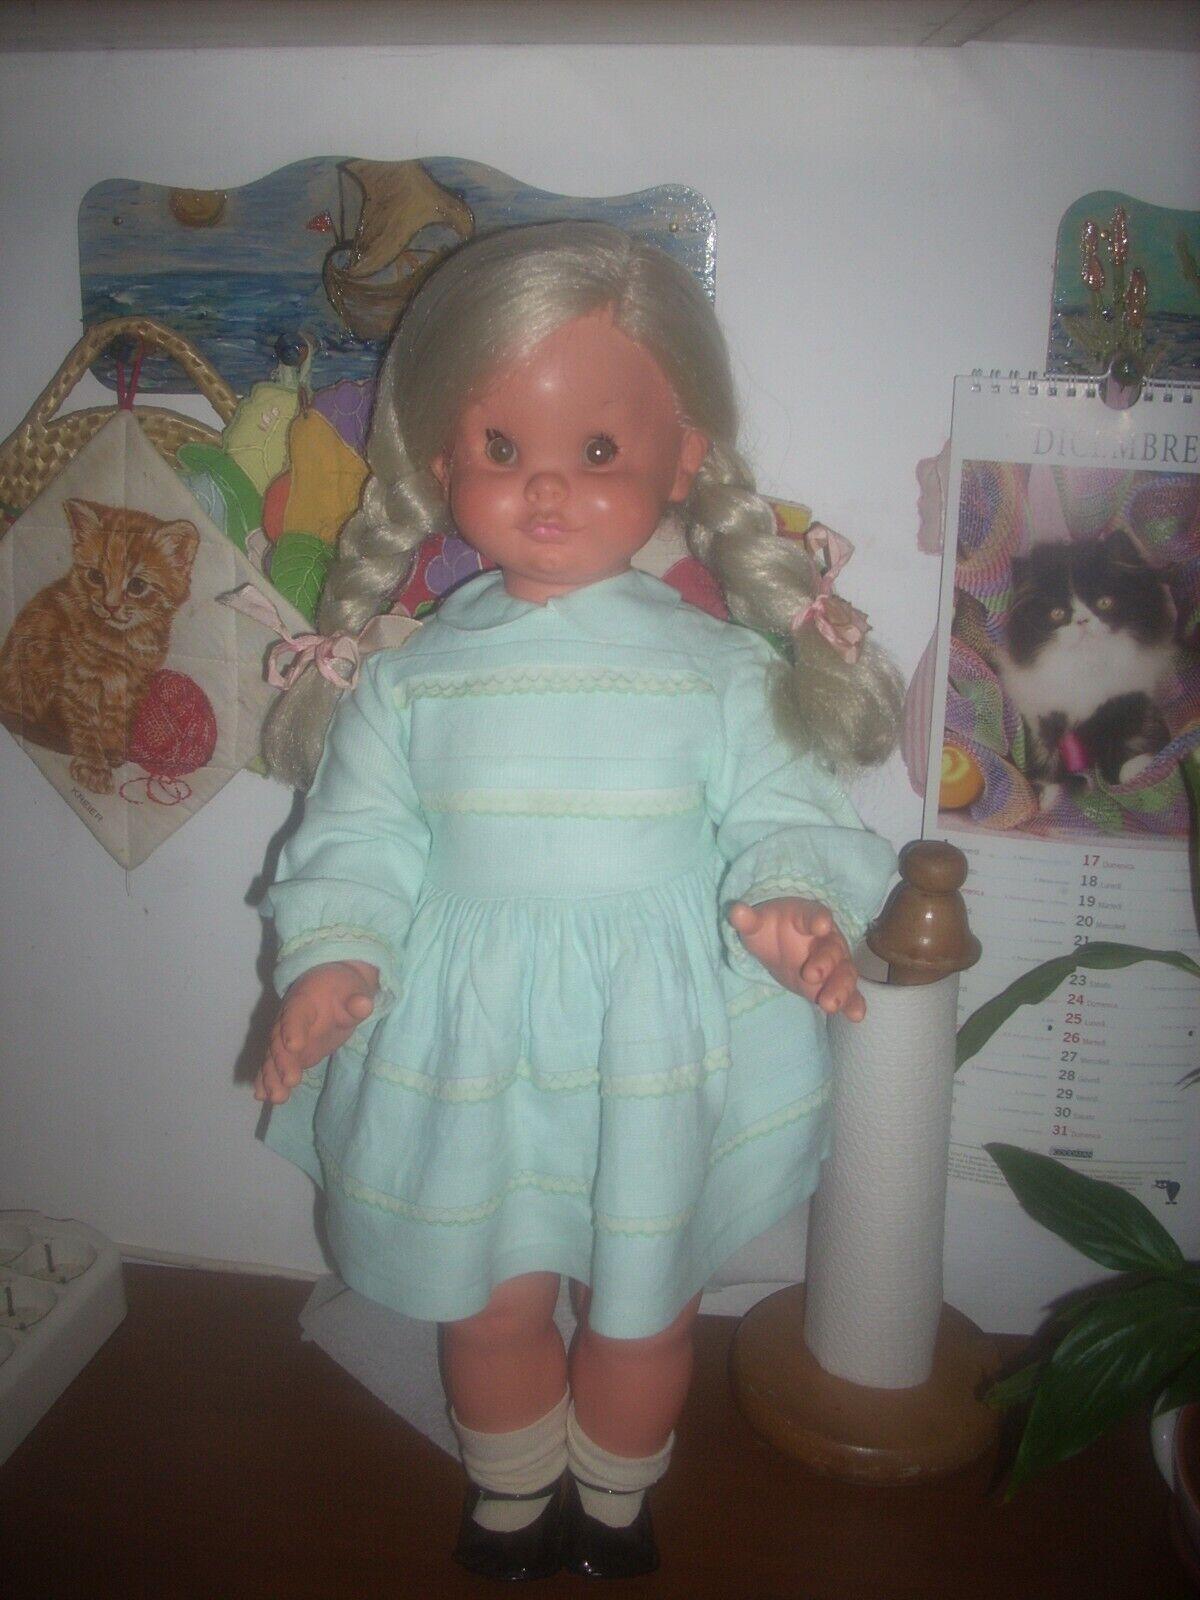 Bambola furga furga furga anno 1962 Valentina h.cm 60 con difetti leggi...... c3fc89